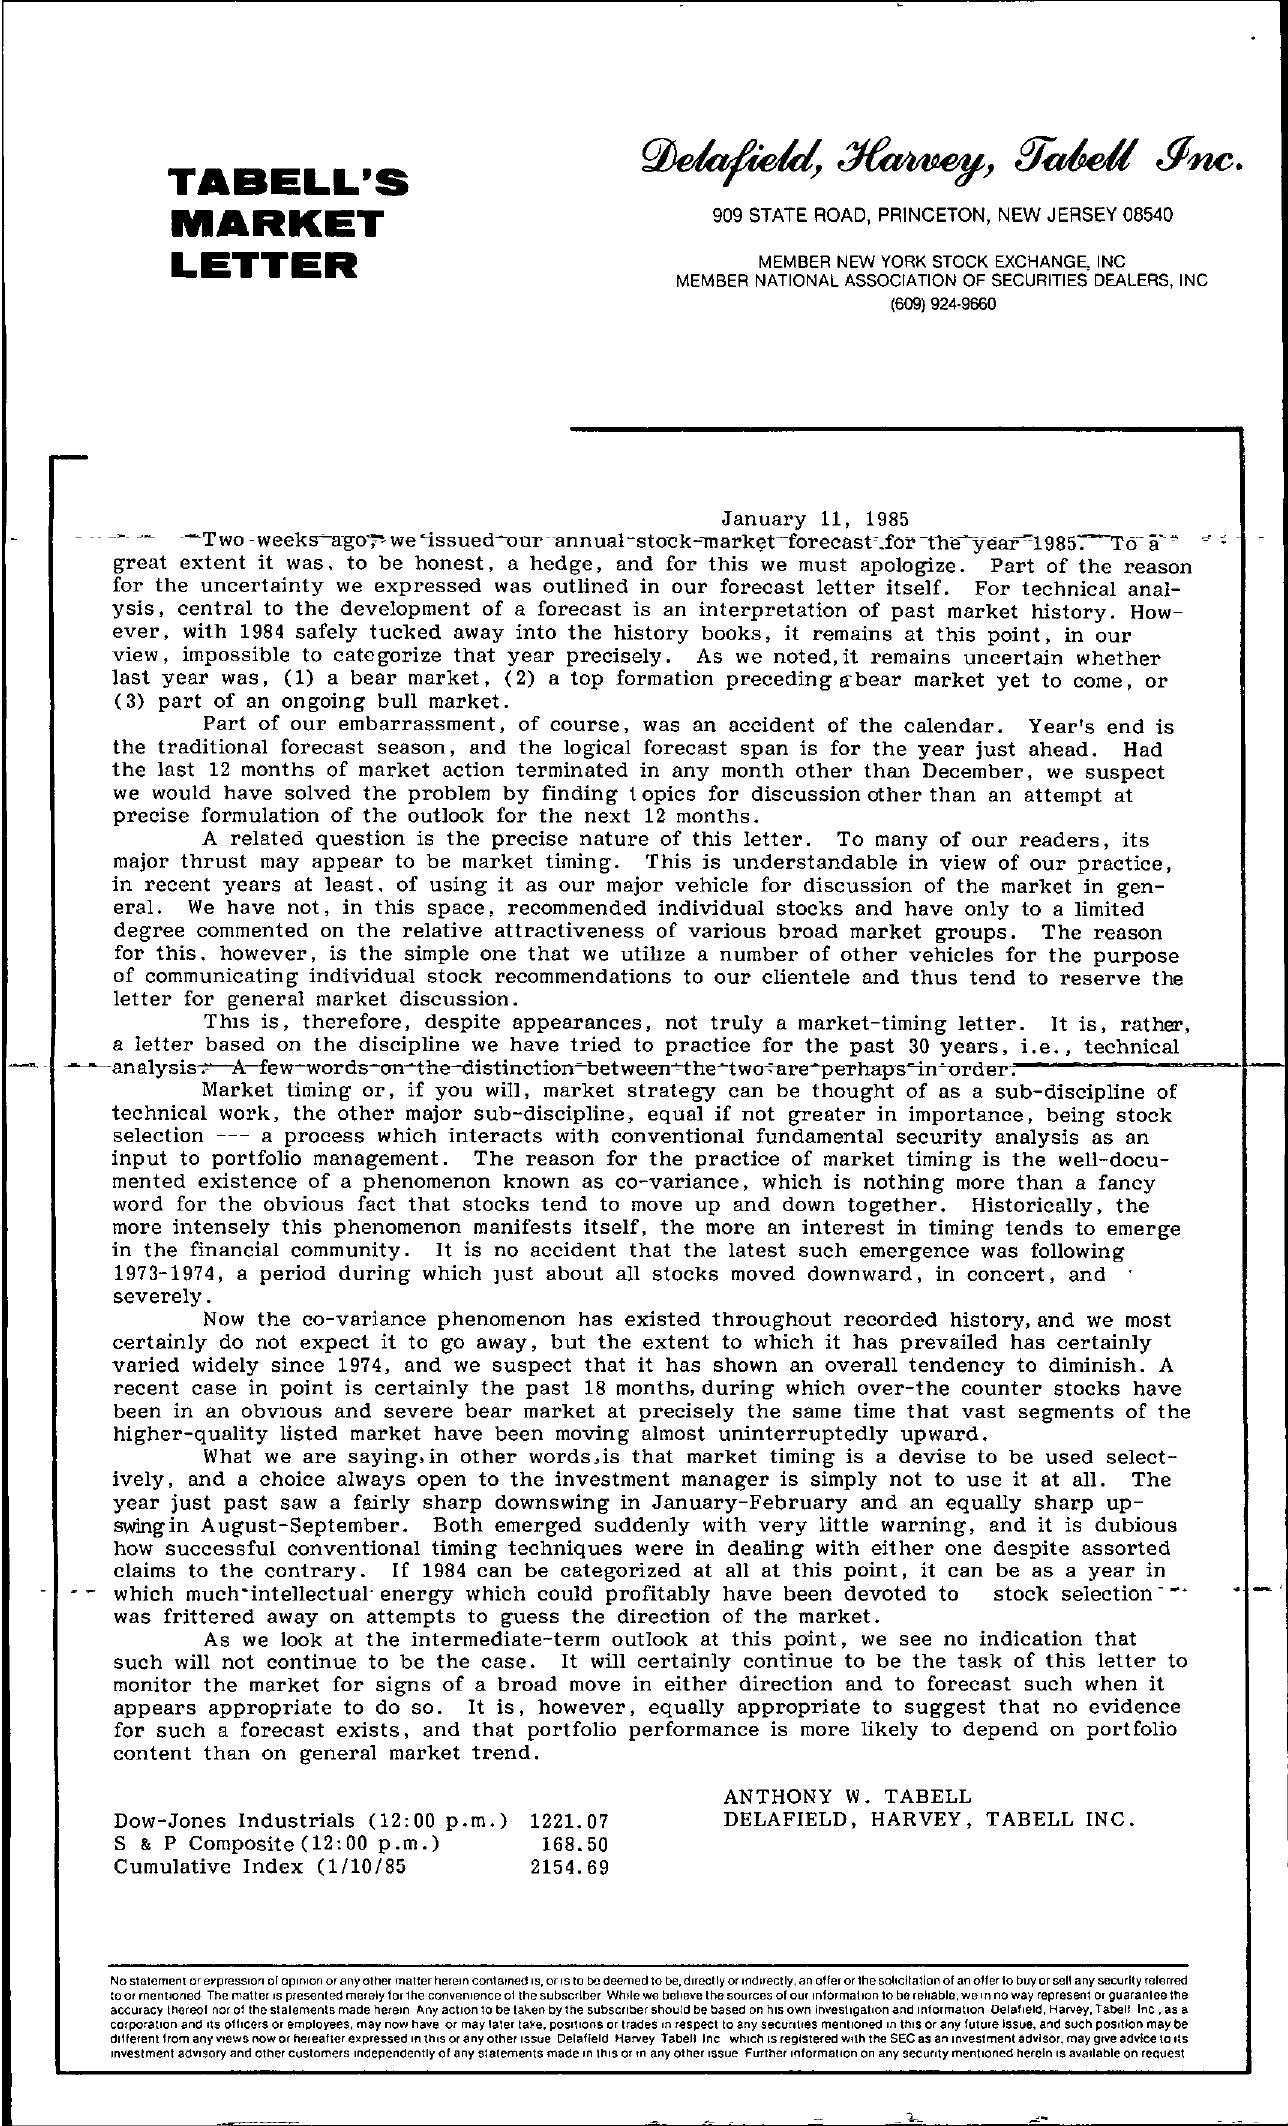 Tabell's Market Letter - January 11, 1985